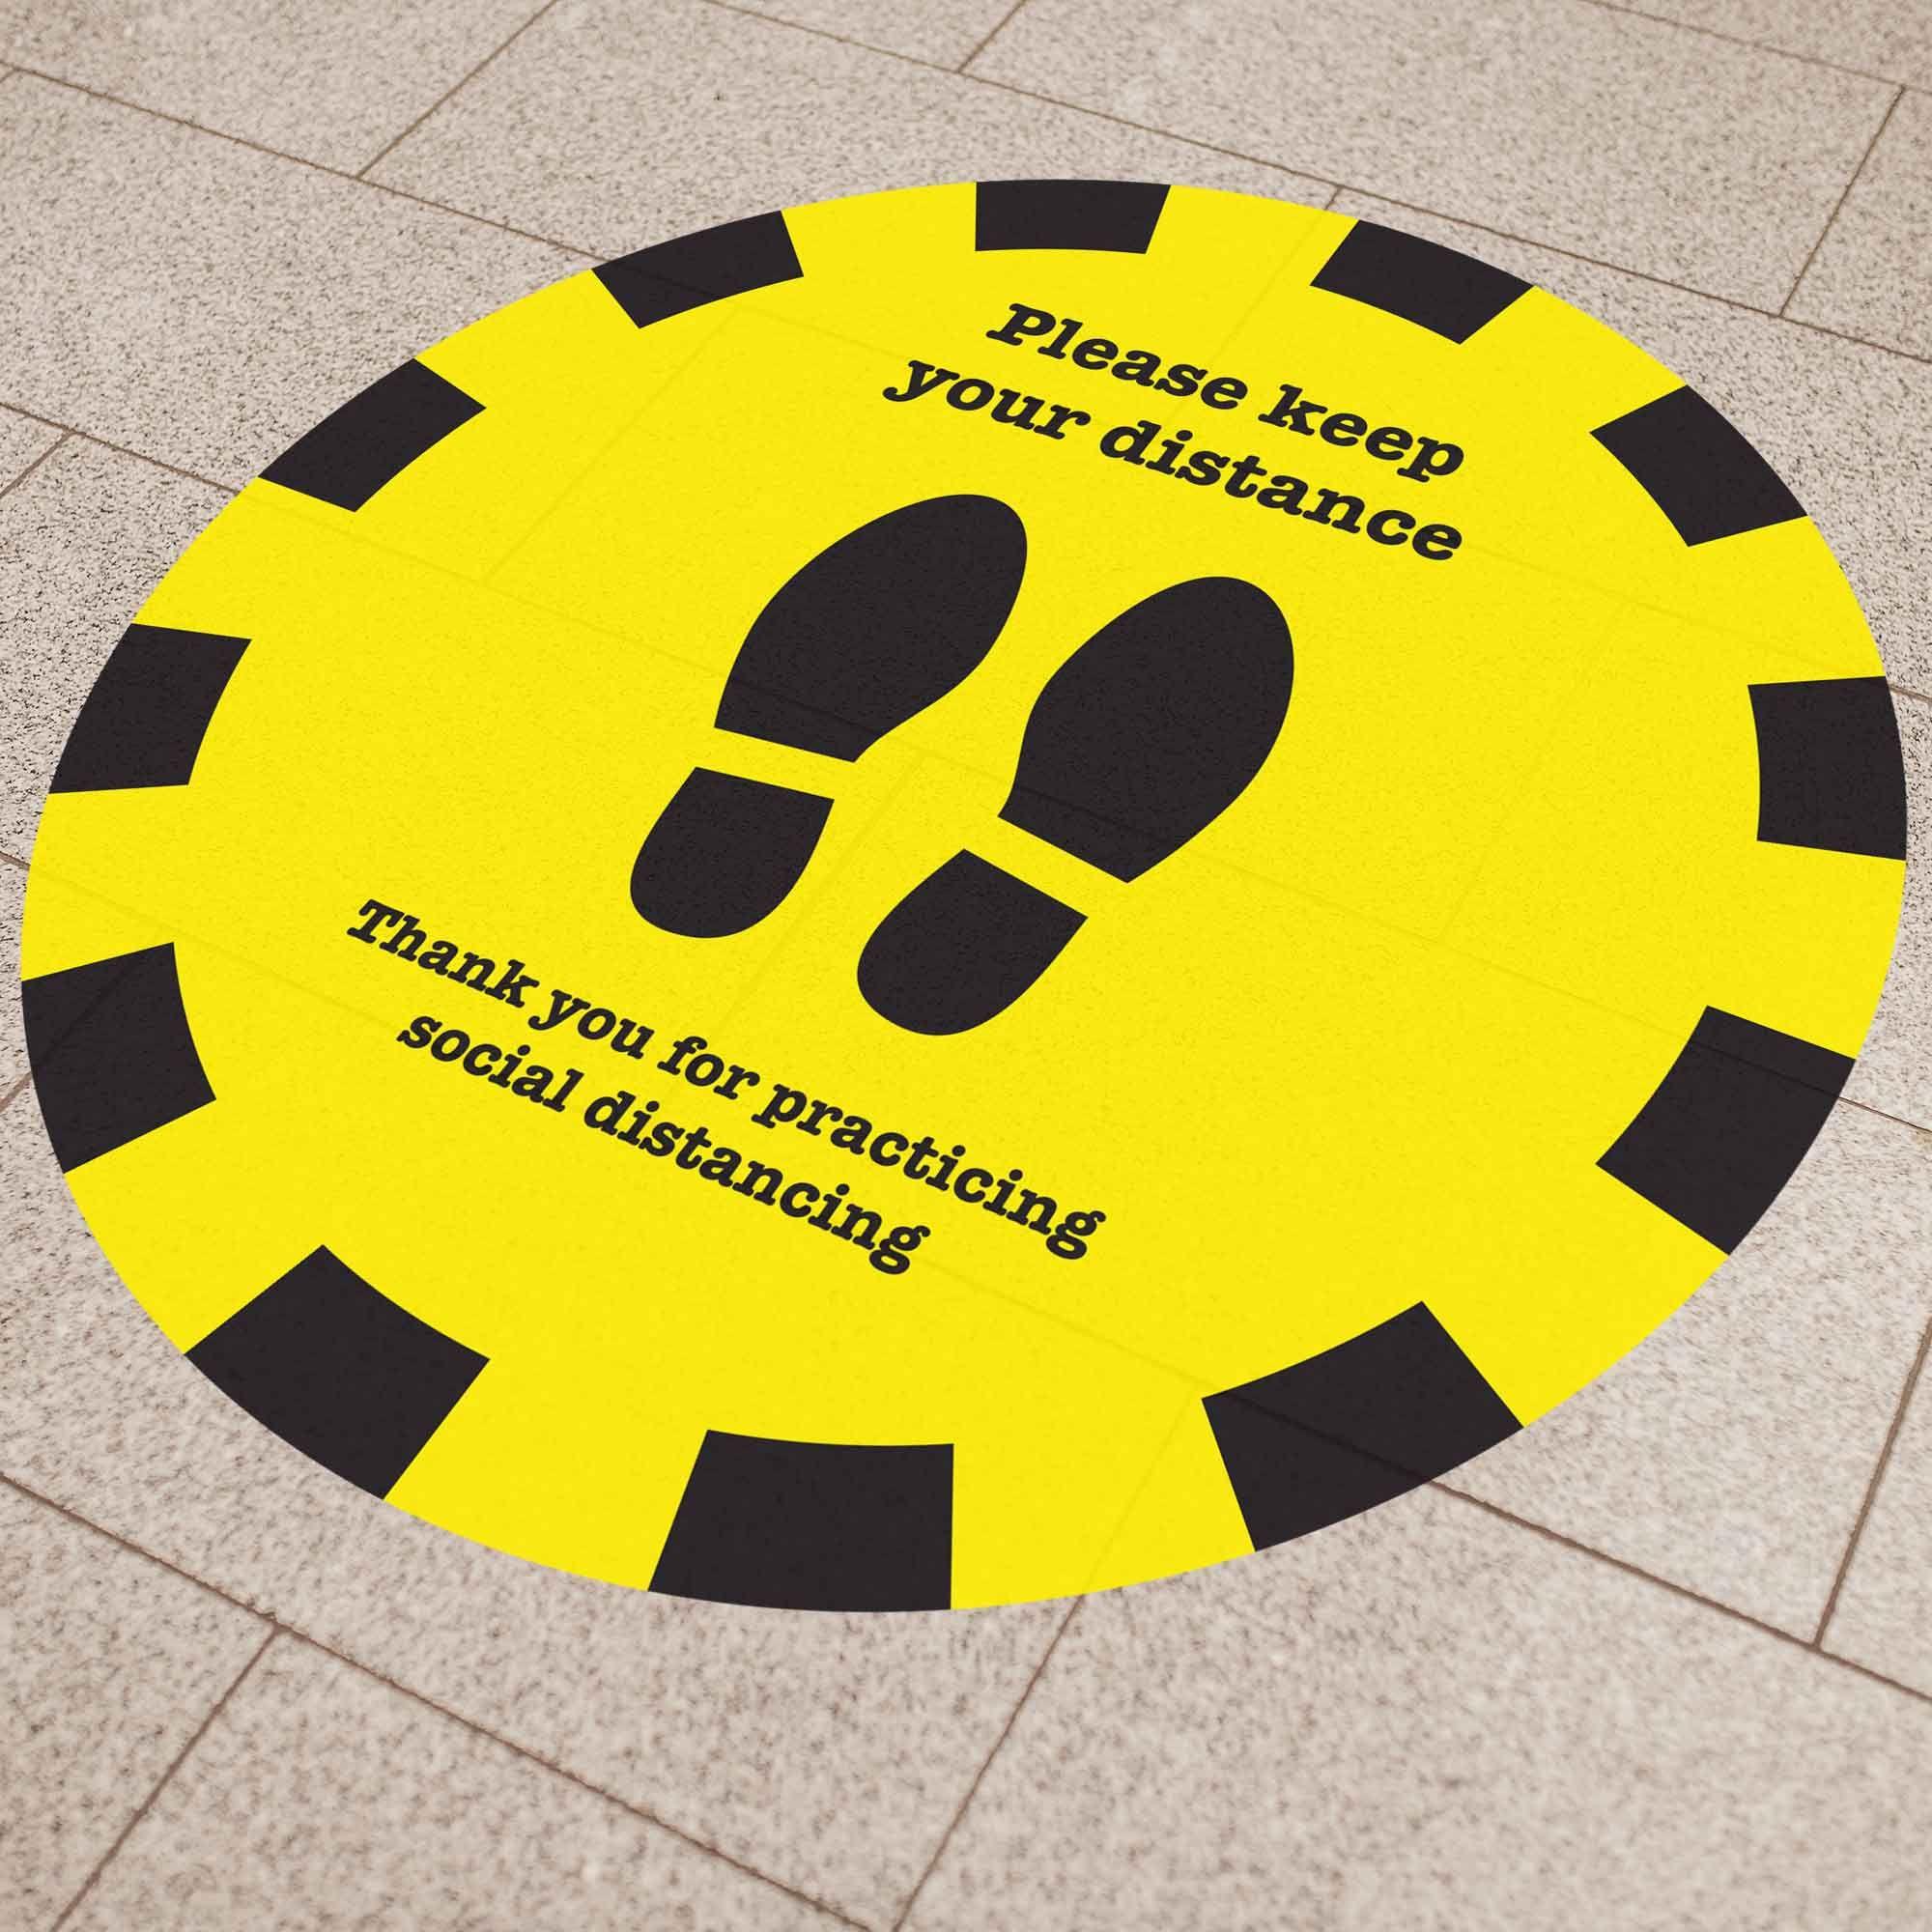 Free Design Template Social Distancing Vinyl Floor Stickers Templates Free Design Floor Stickers Design Template